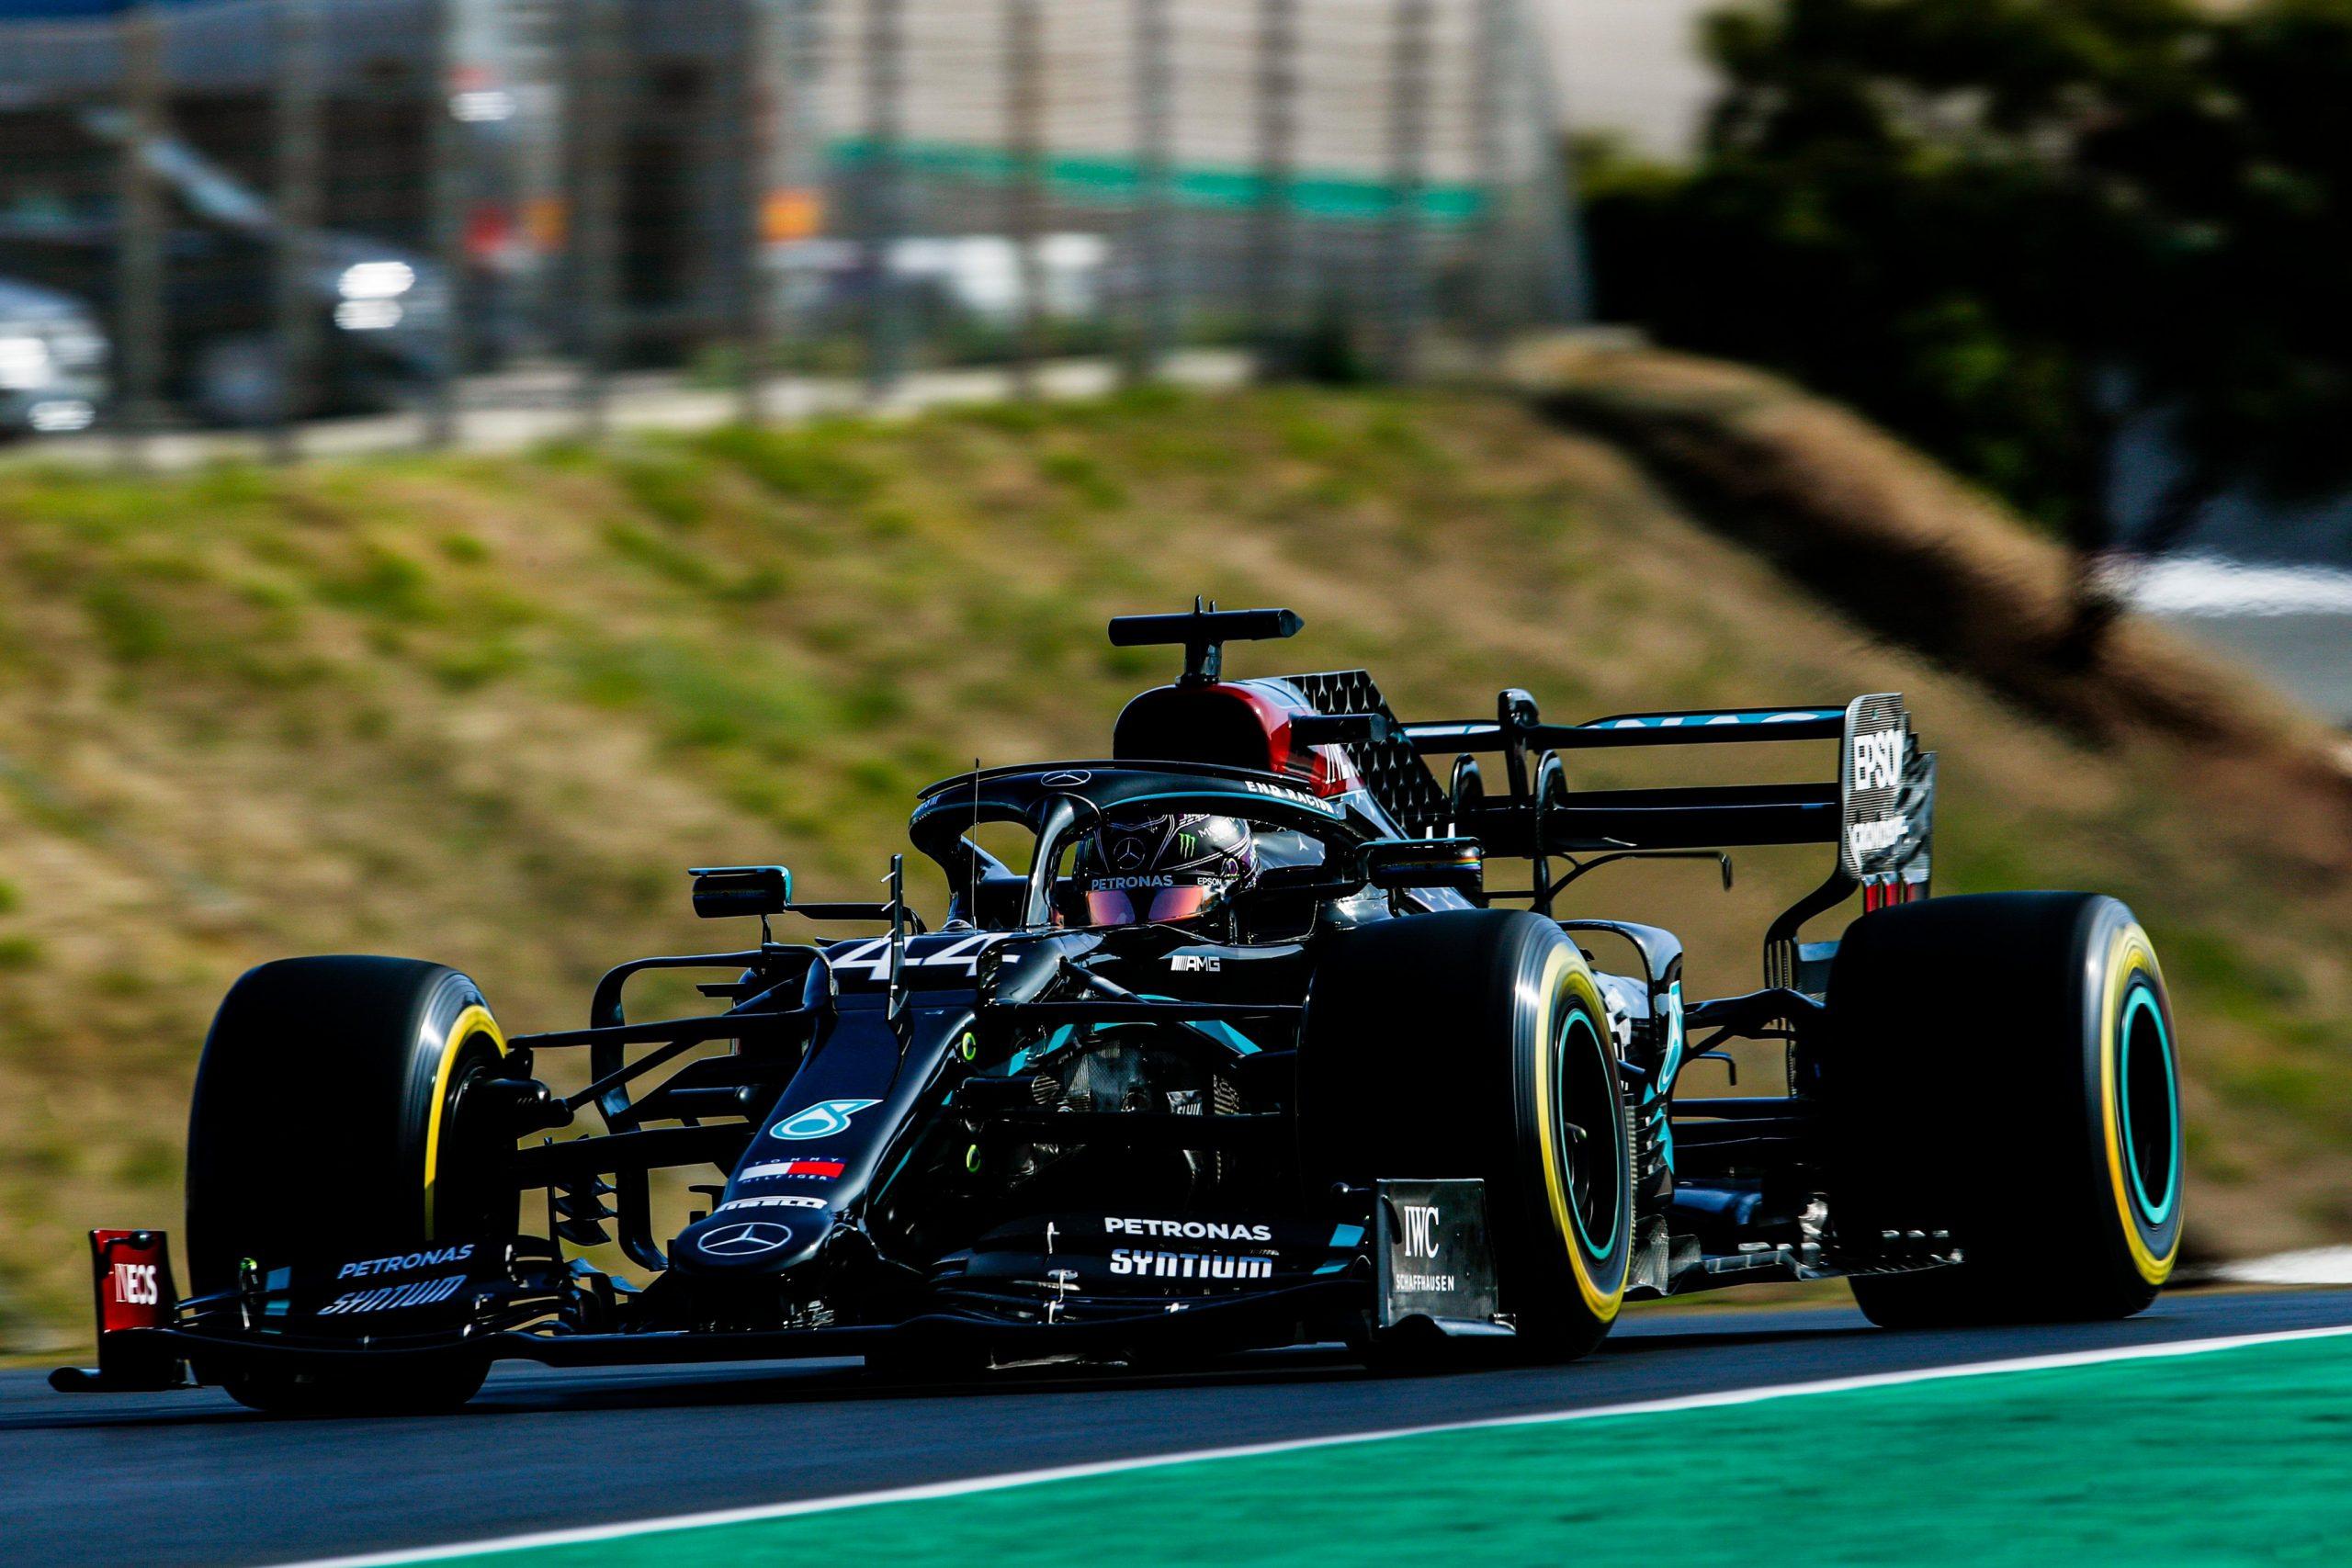 F1 - Lewis Hamilton victime d'une crampe en fin de Grand Prix